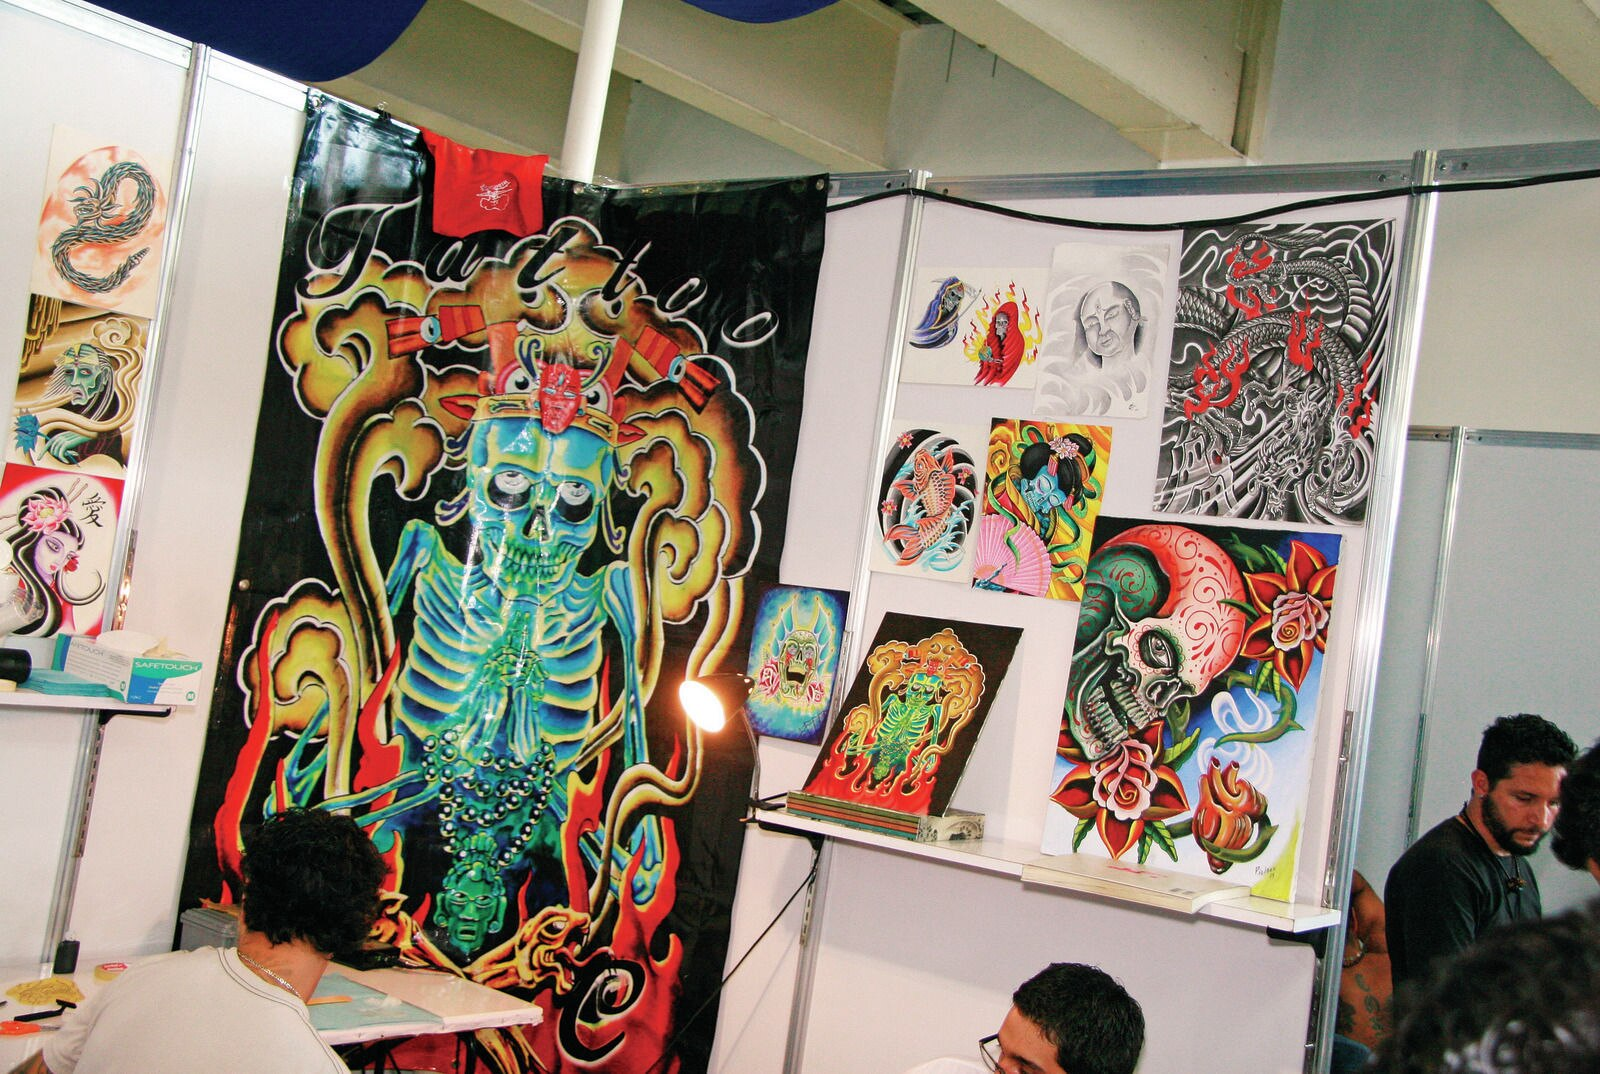 1102-lras-07-o-mexico-city-tattoo-convention-murals.JPG1